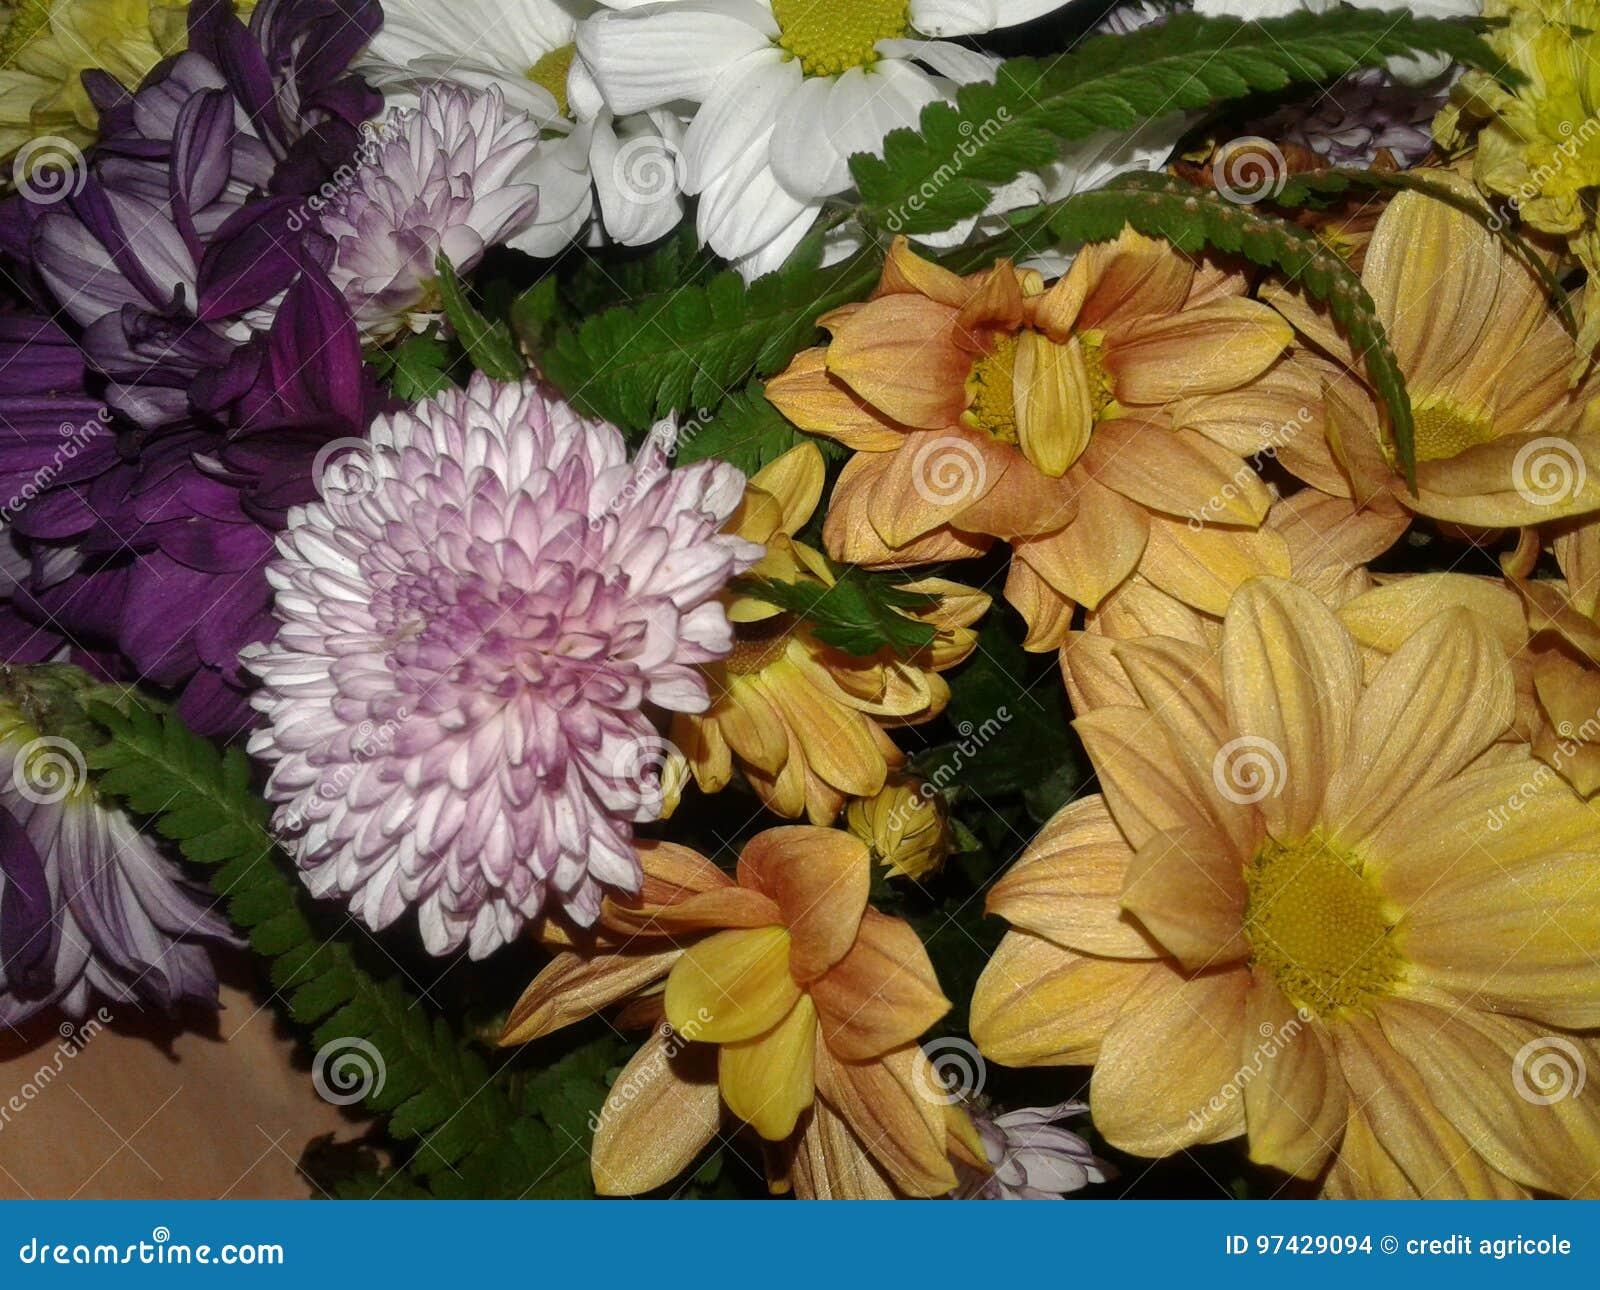 Flowers stock photo image of plants beautiful conquered 97429094 download flowers stock photo image of plants beautiful conquered 97429094 izmirmasajfo